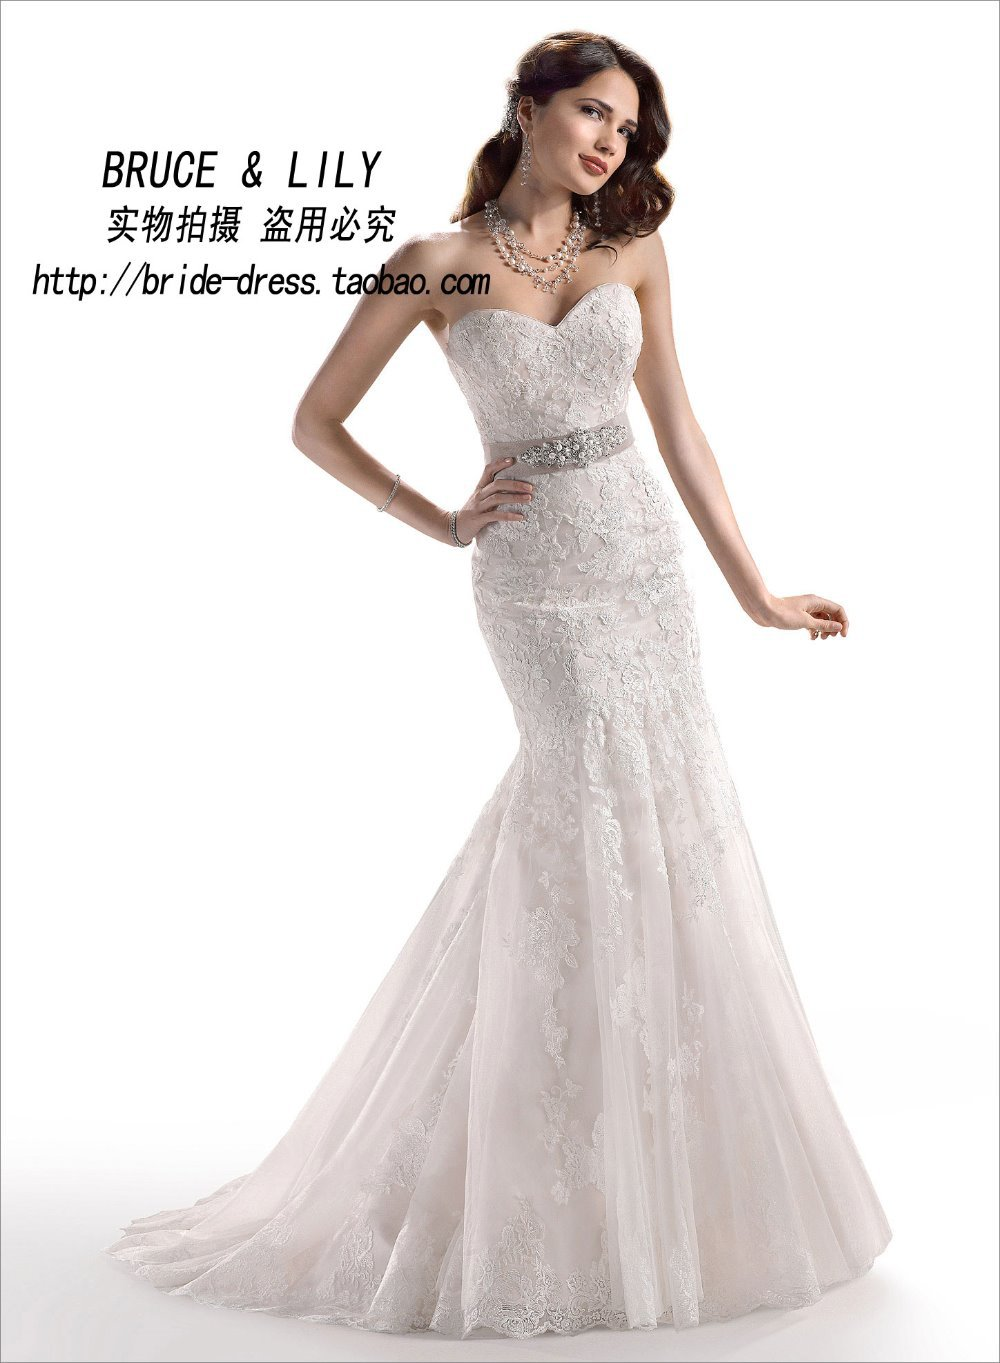 Free Shipping Cheap Pearls Vestido De Noiva Robe De Mariage 2016 Fashionable Sweetheart Lace Mermaid Wedding Dress Bridal Gown